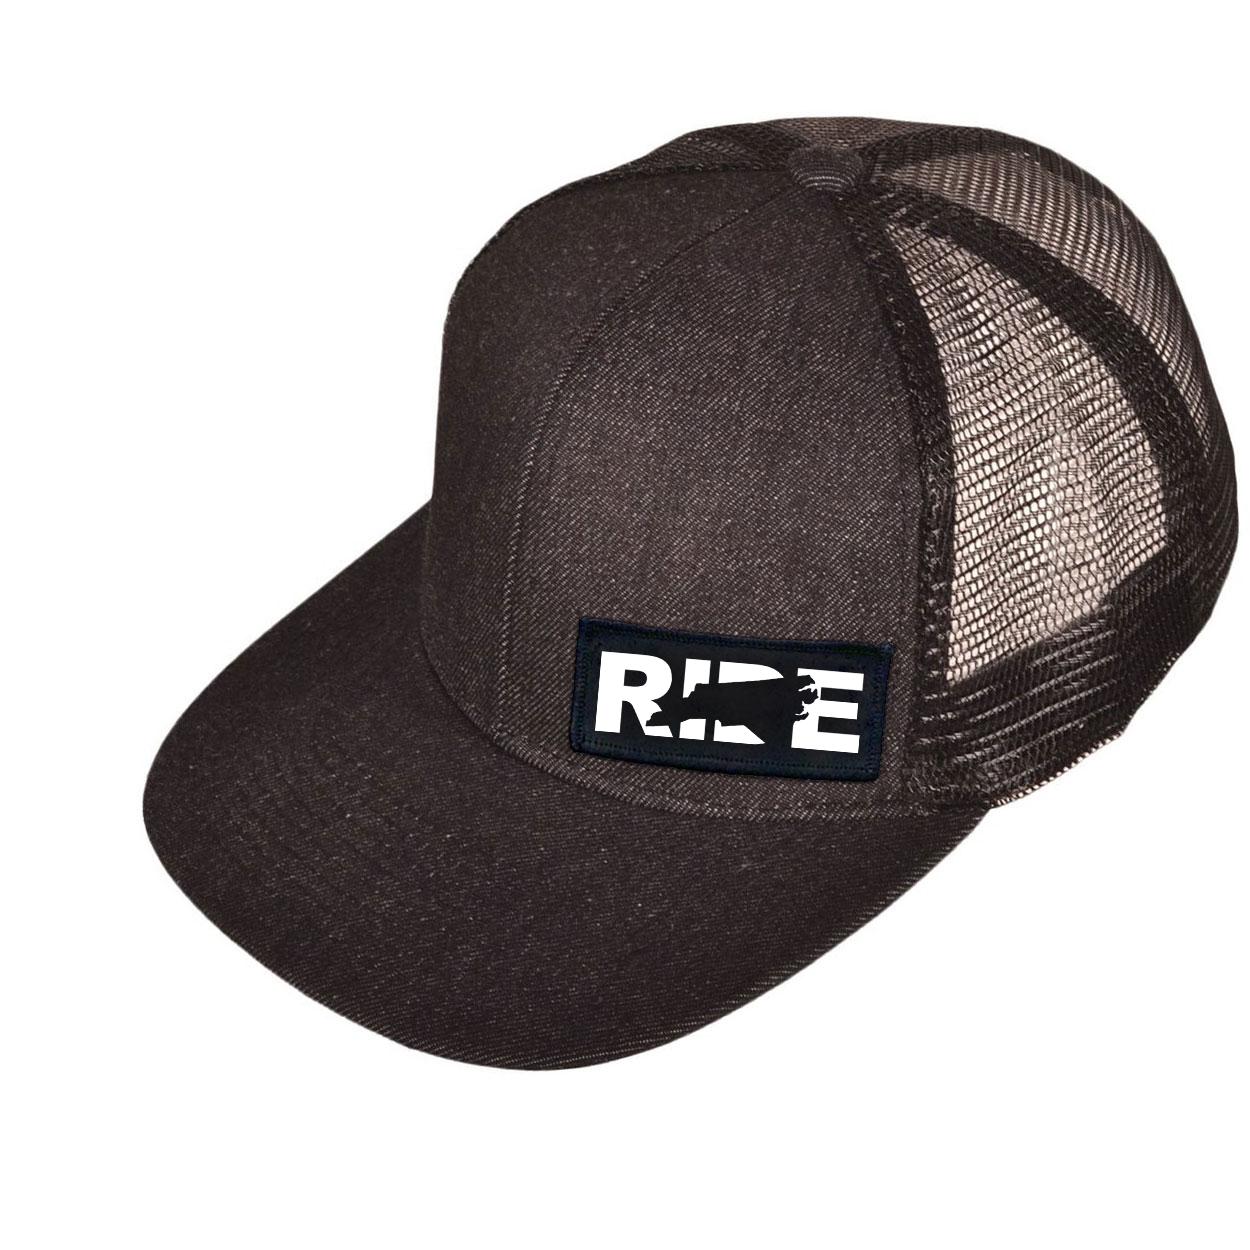 Ride North Carolina Night Out Woven Patch Snapback Flat Brim Hat Black Denim (White Logo)